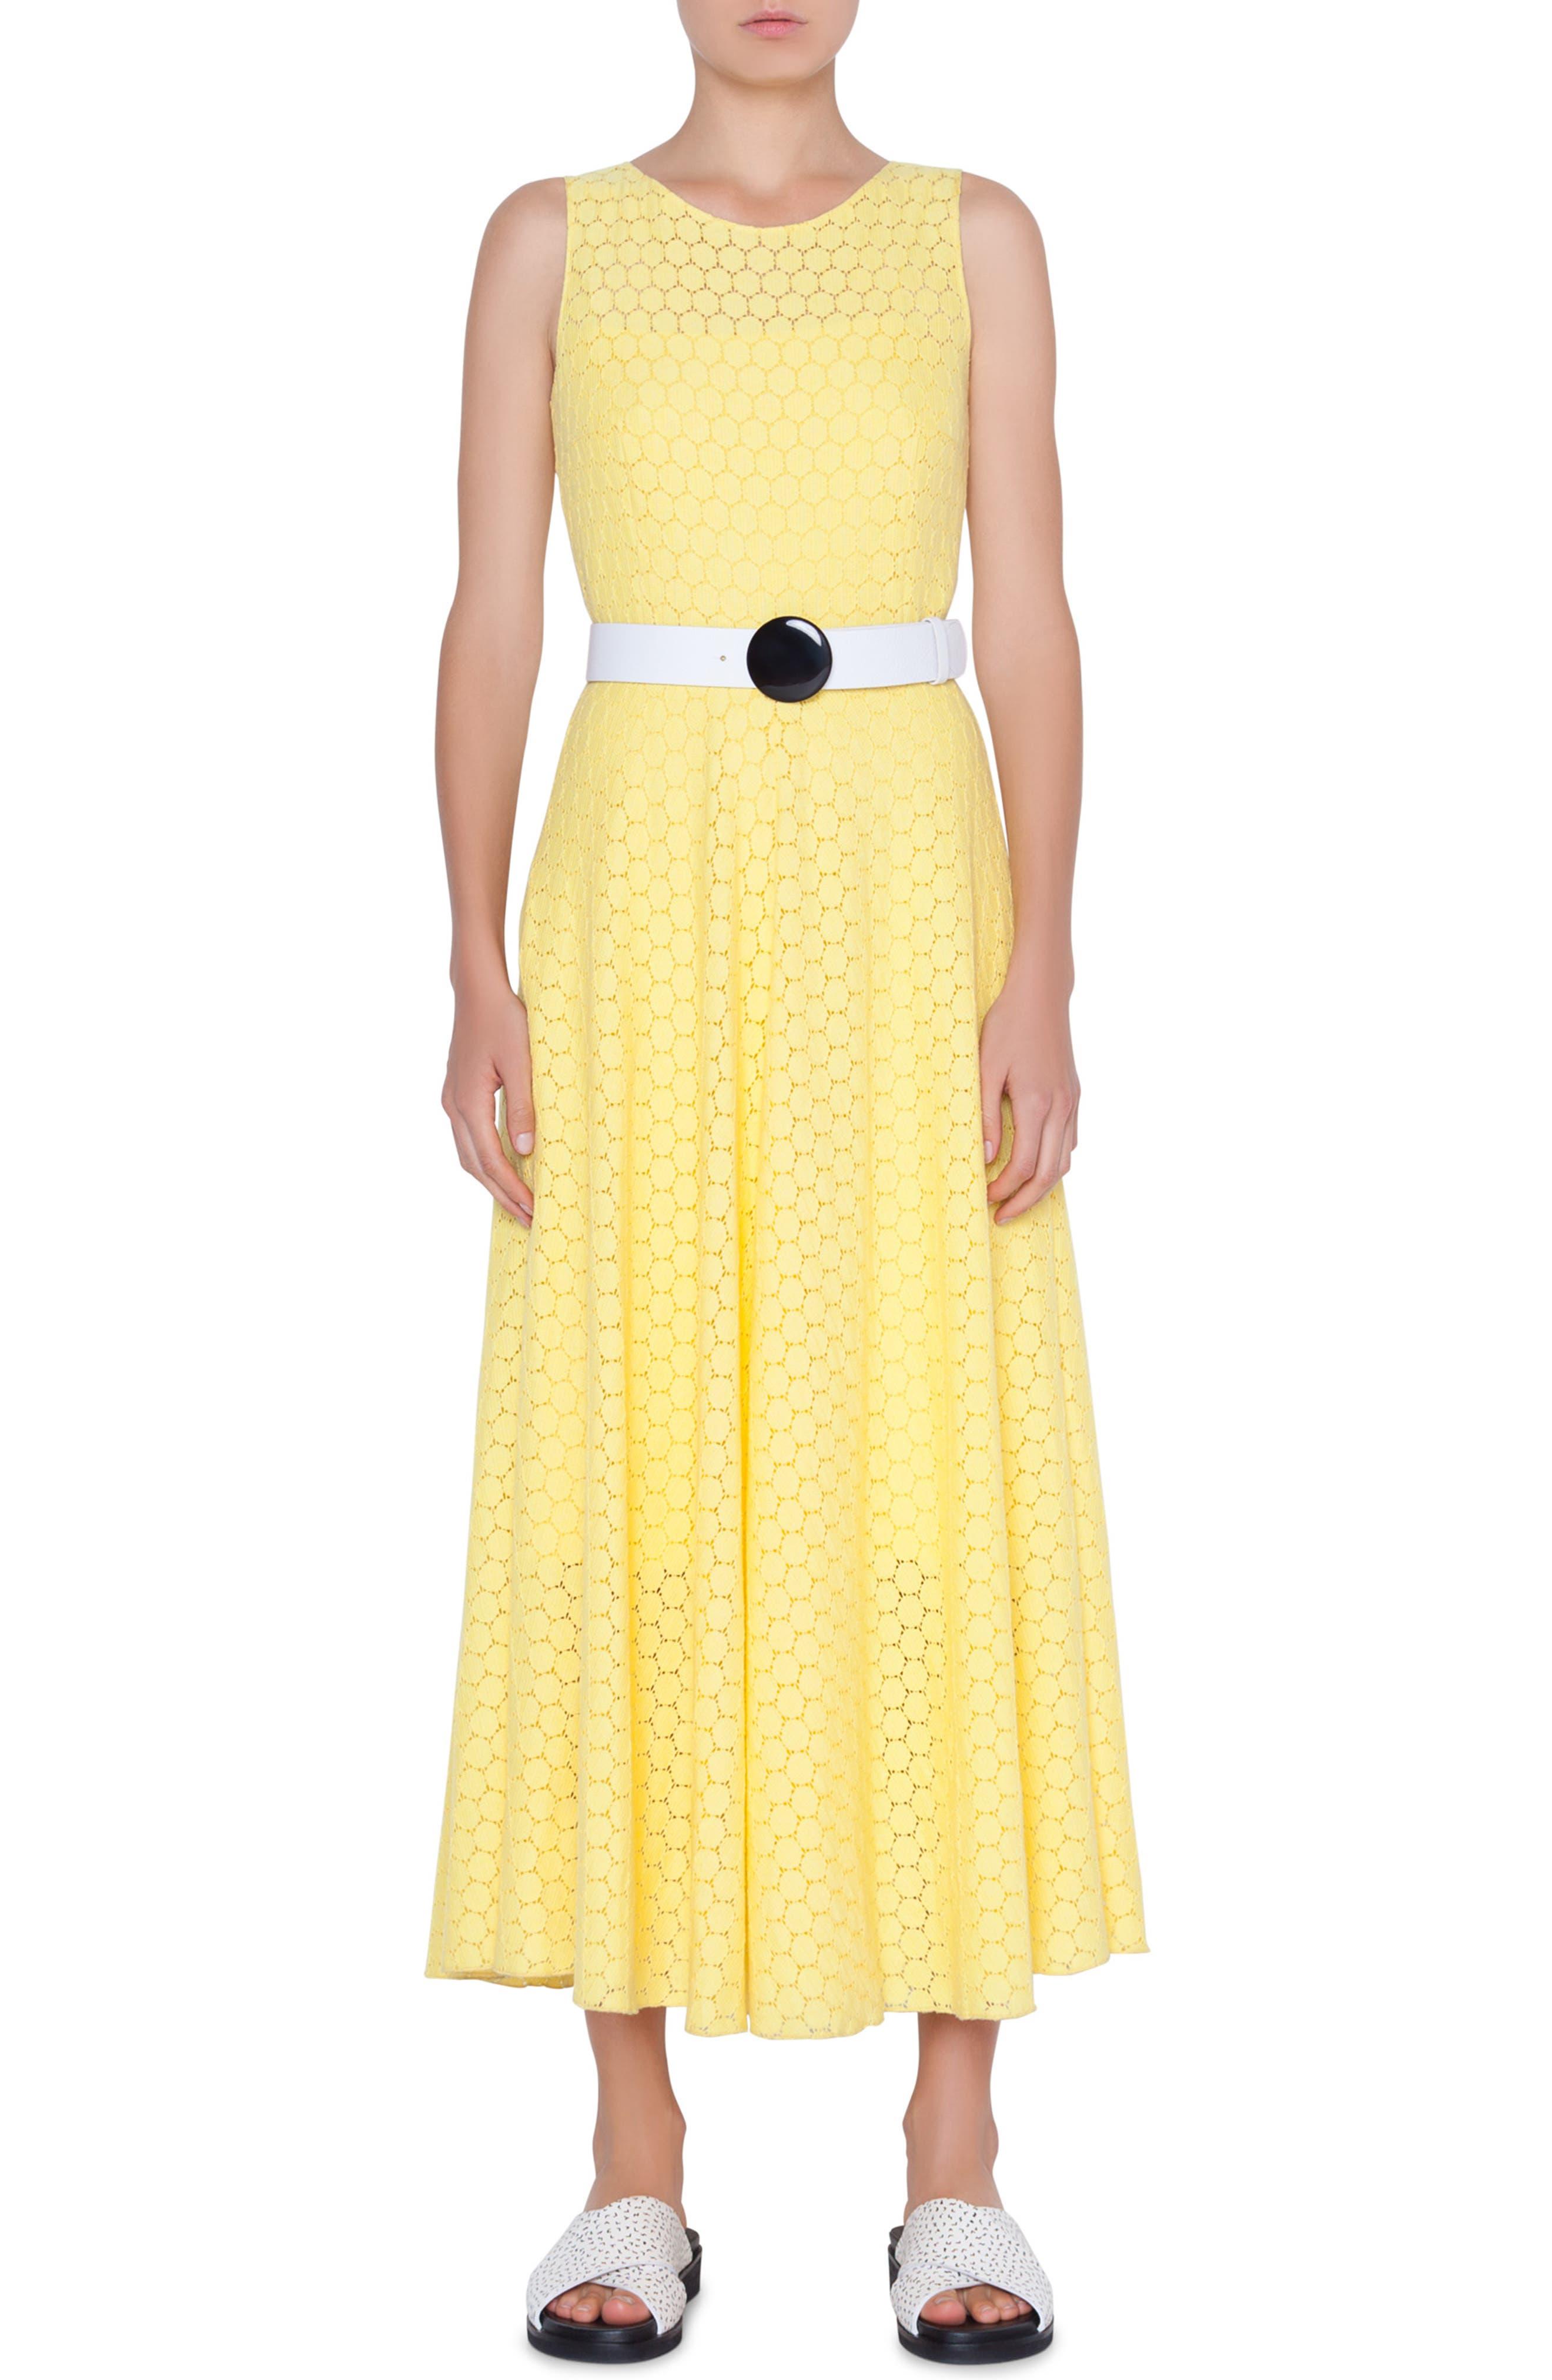 AKRIS PUNTO,                             Belted Lace Dress,                             Main thumbnail 1, color,                             LIMONE